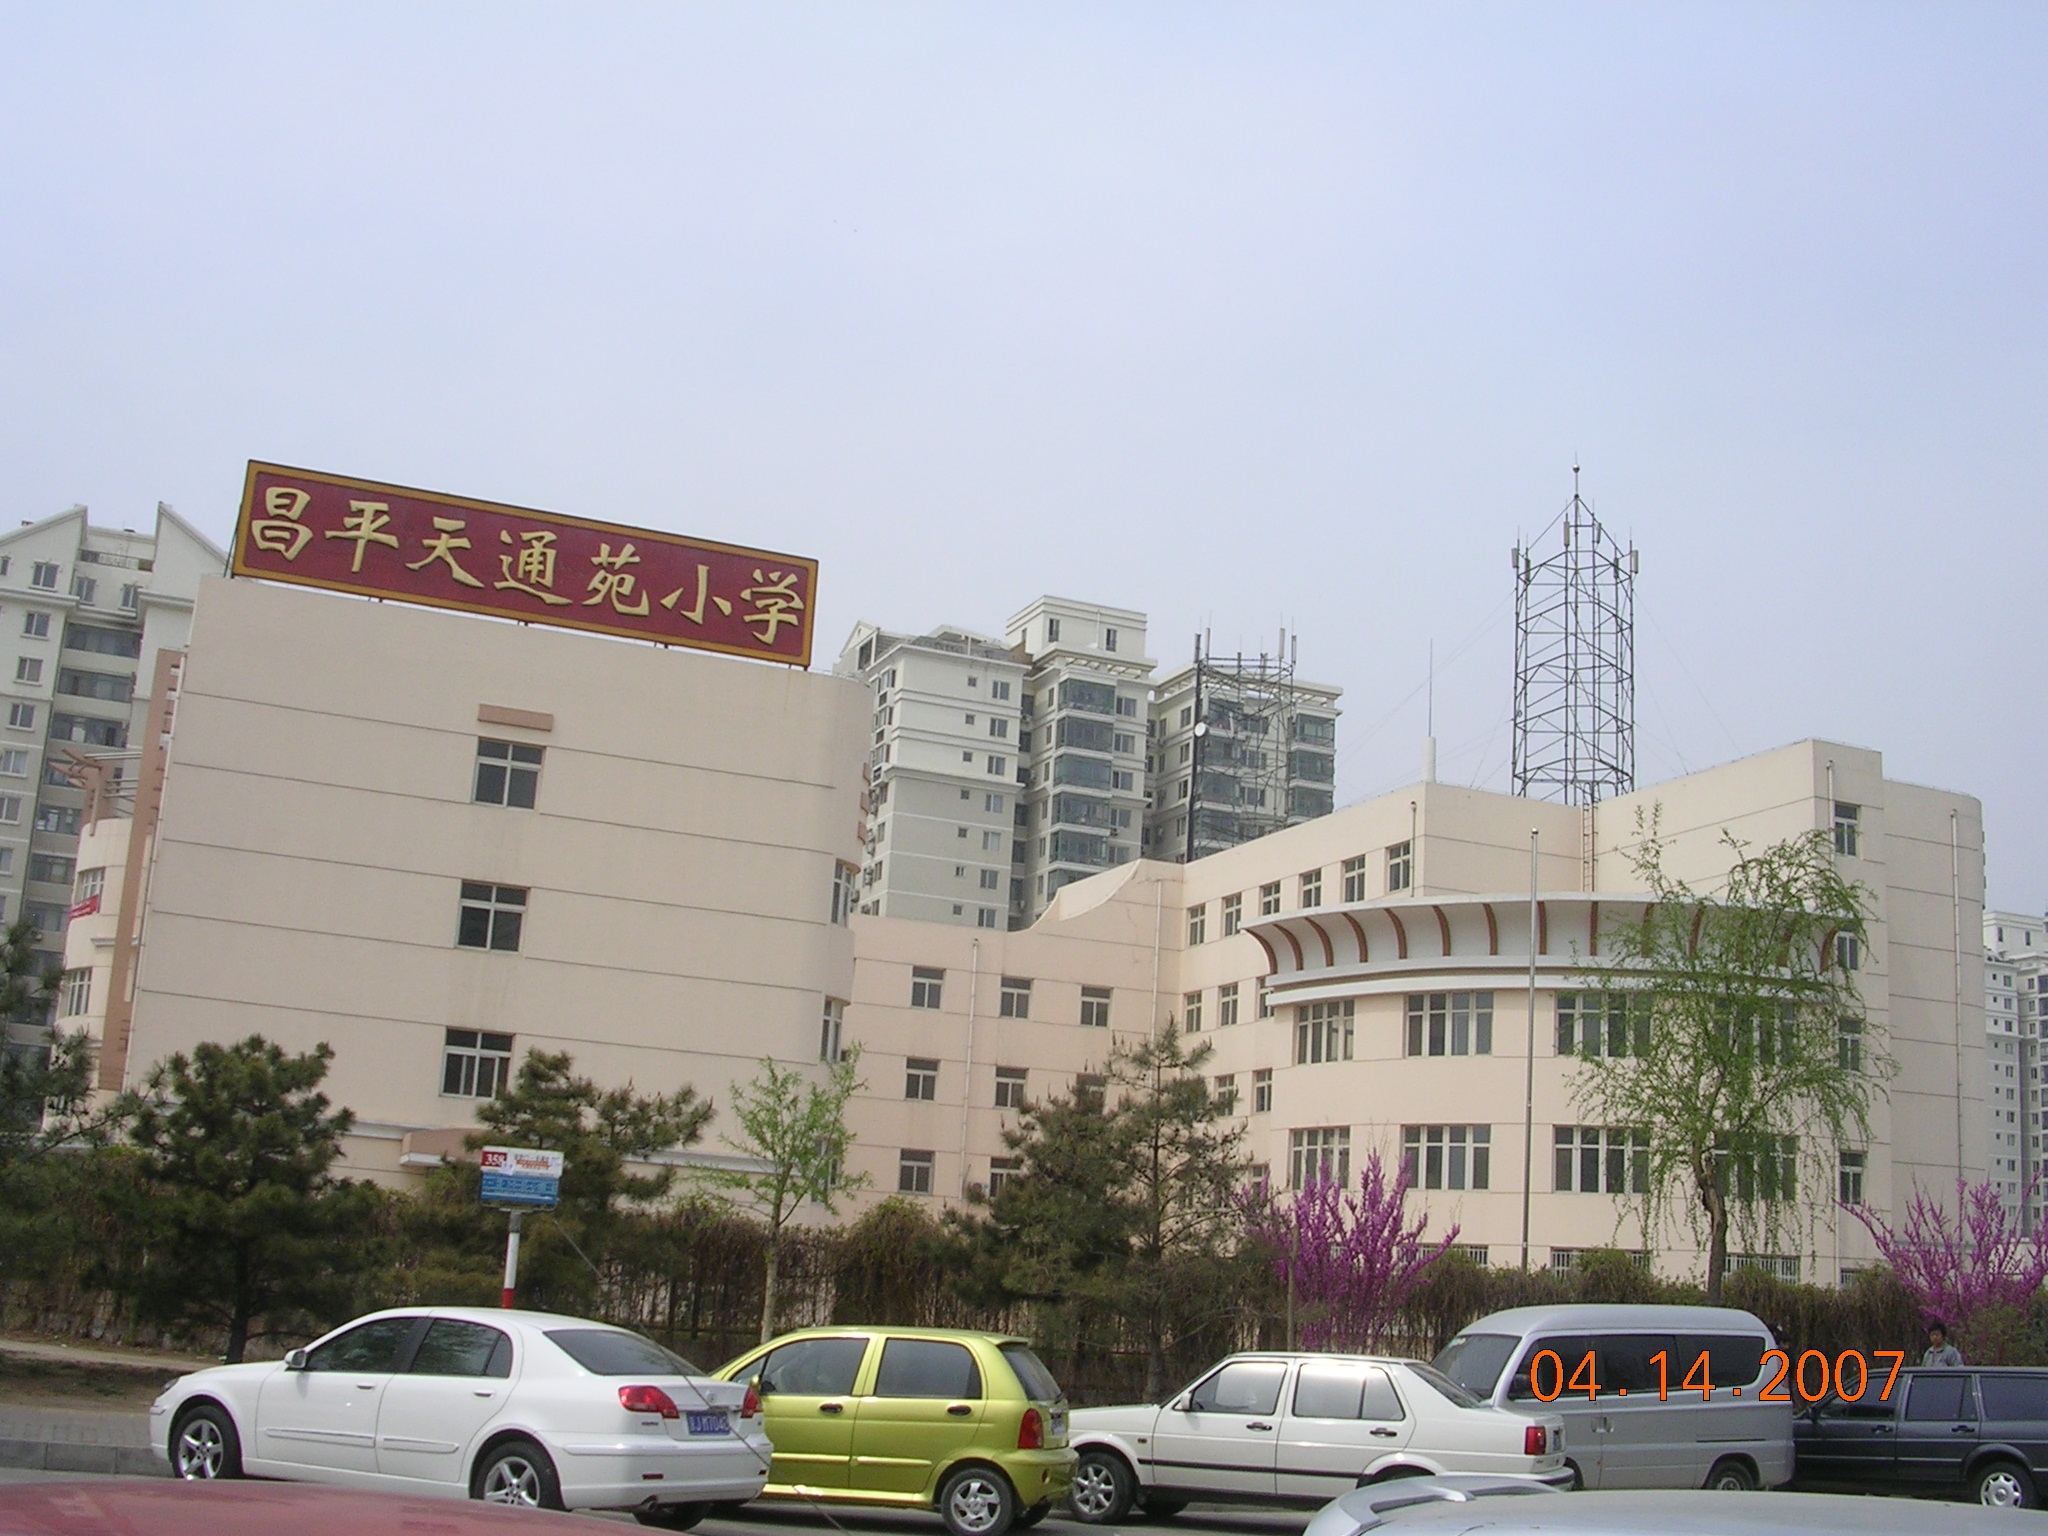 2007-04-15A 006.jpg